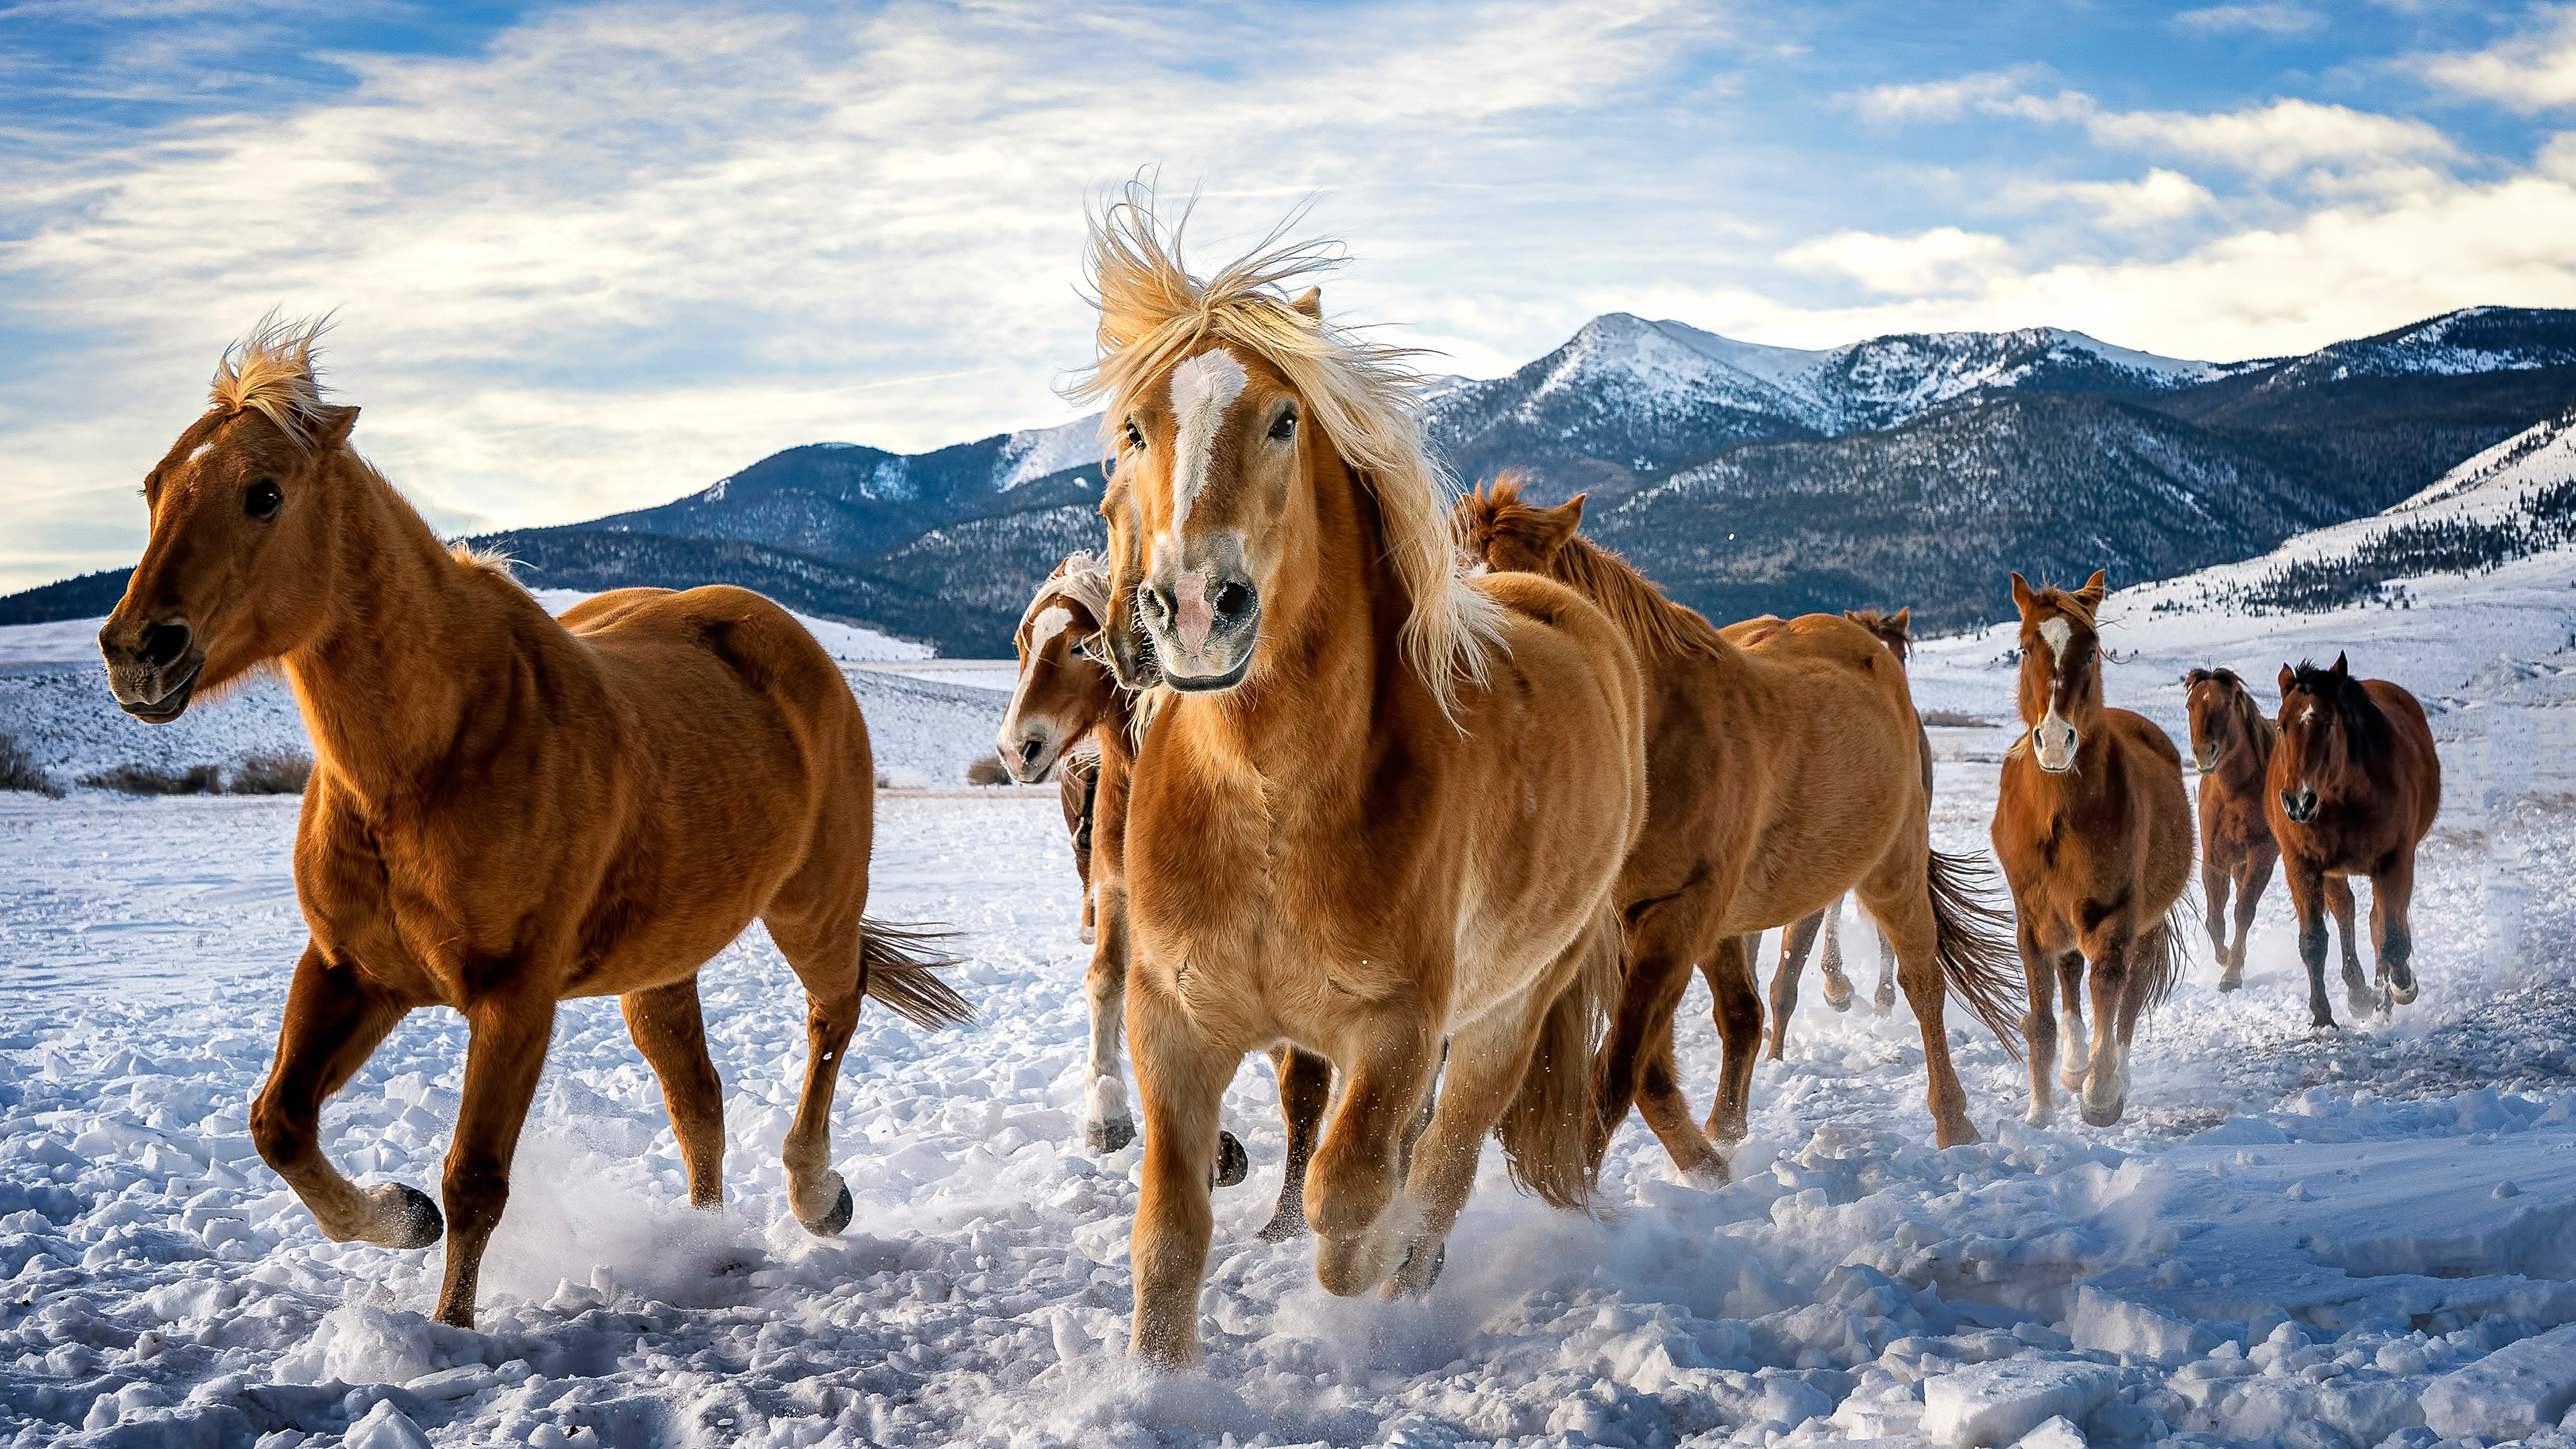 Wallpaper Horses running in the snow